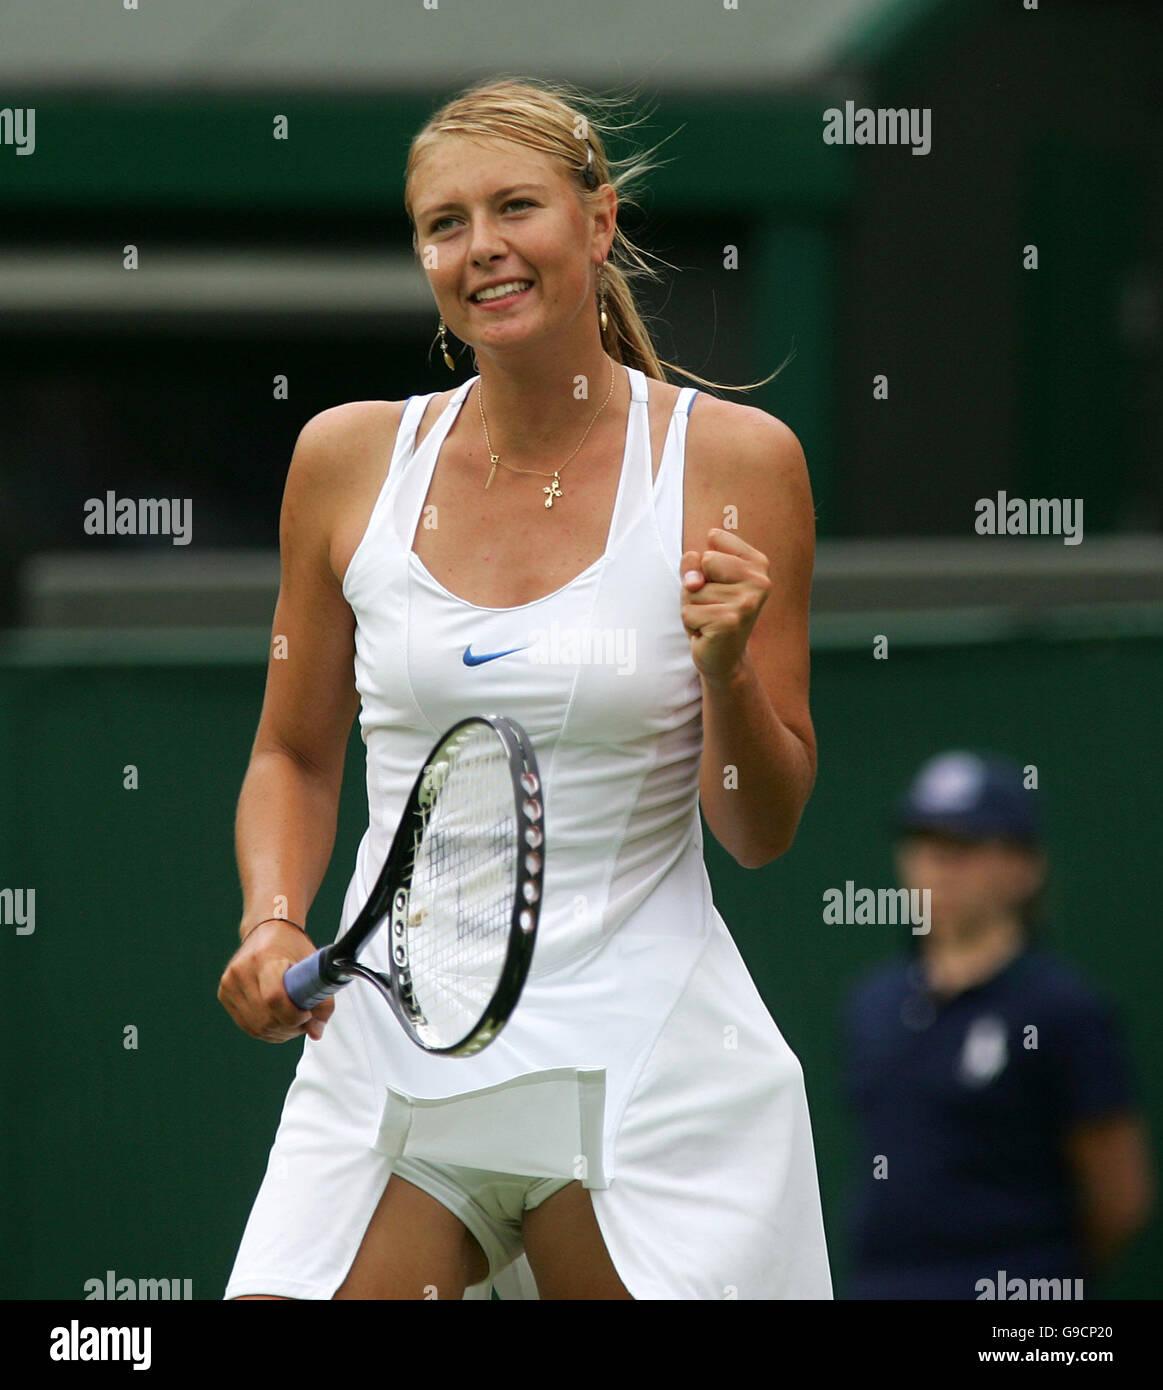 Faultless! How Anna Kournikova & Maria Sharapova changed